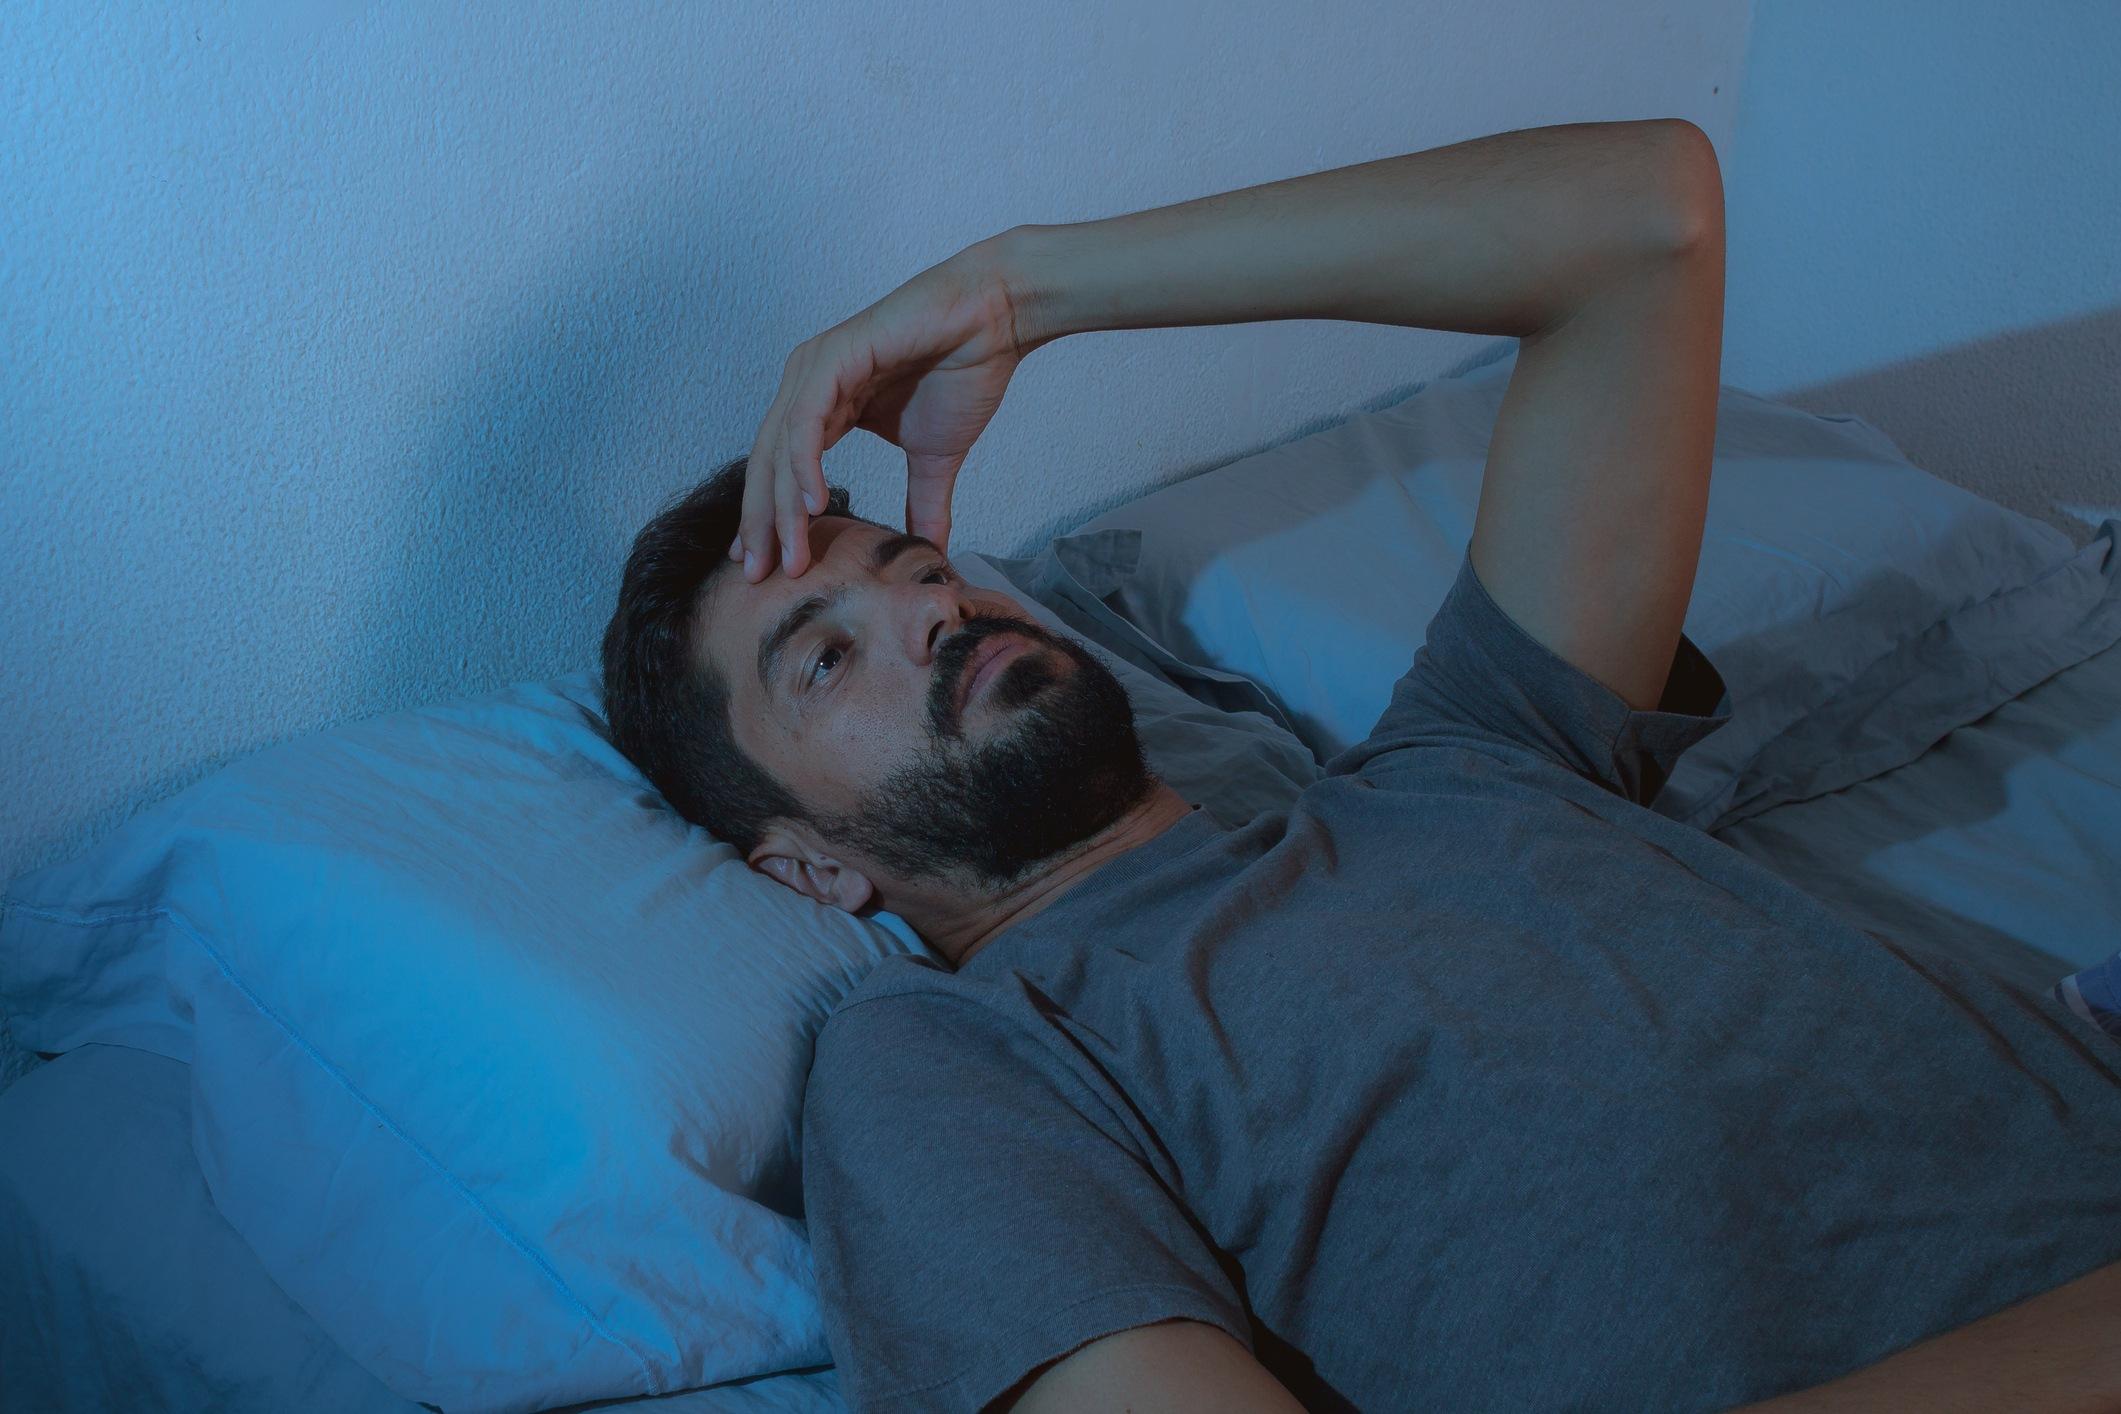 insomnia. young beard man lying